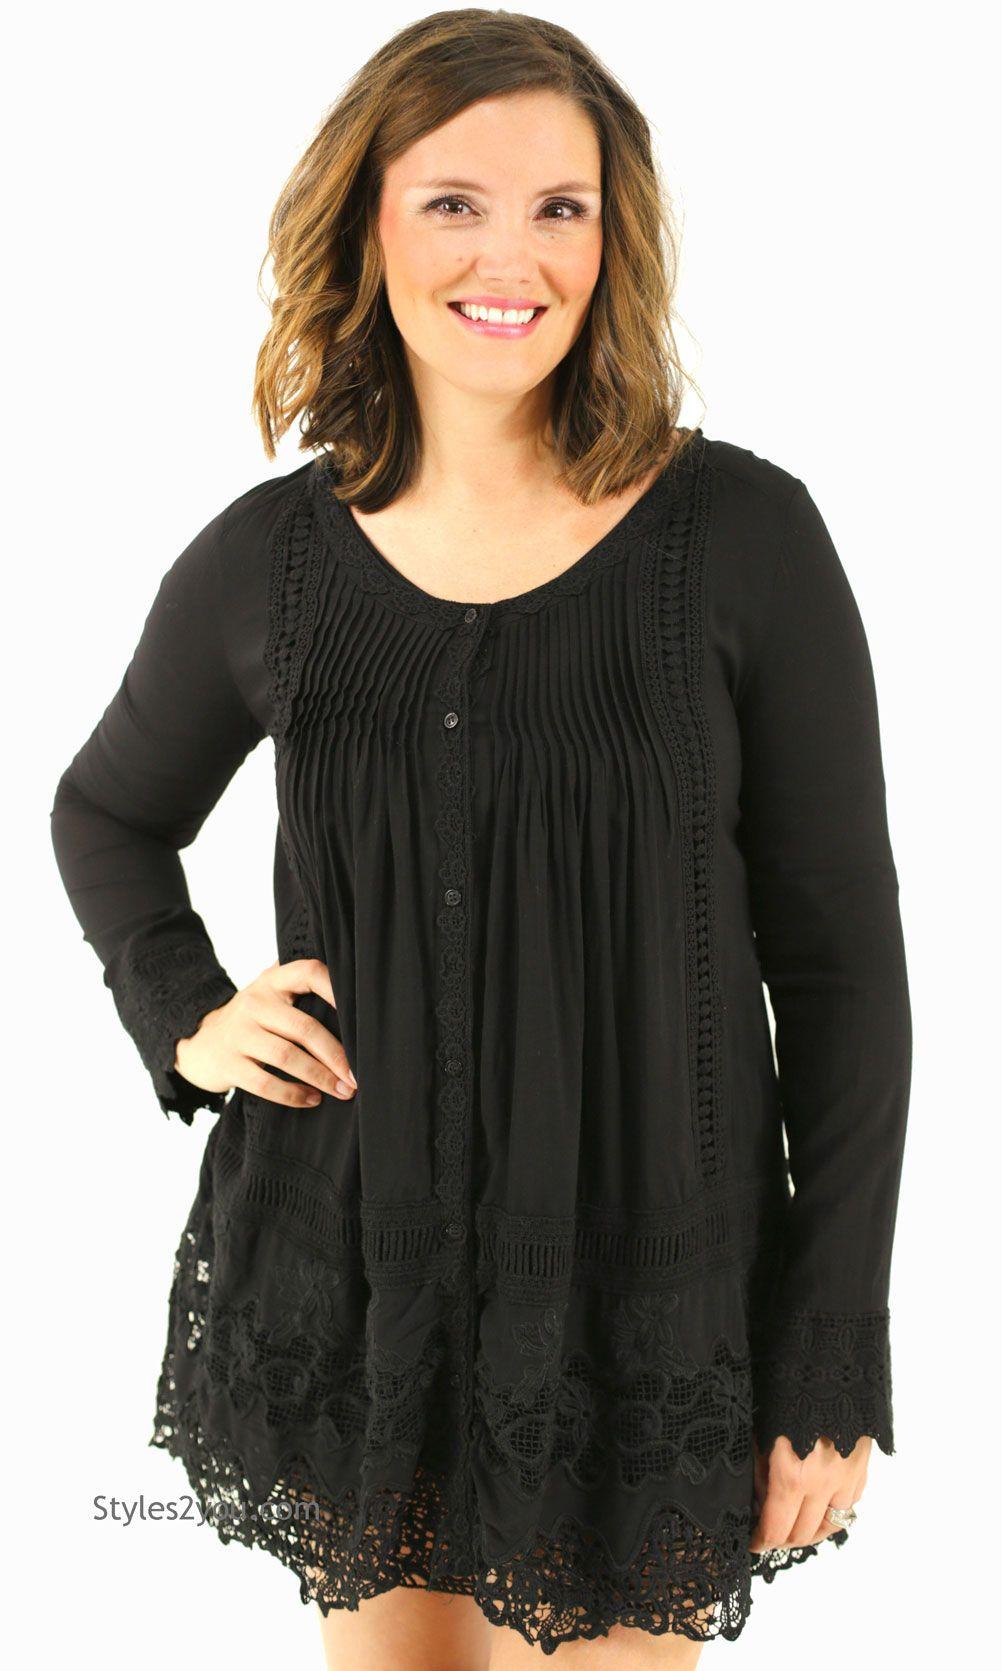 Greta long sleeve crochet lace shirt dress in black monoreno top